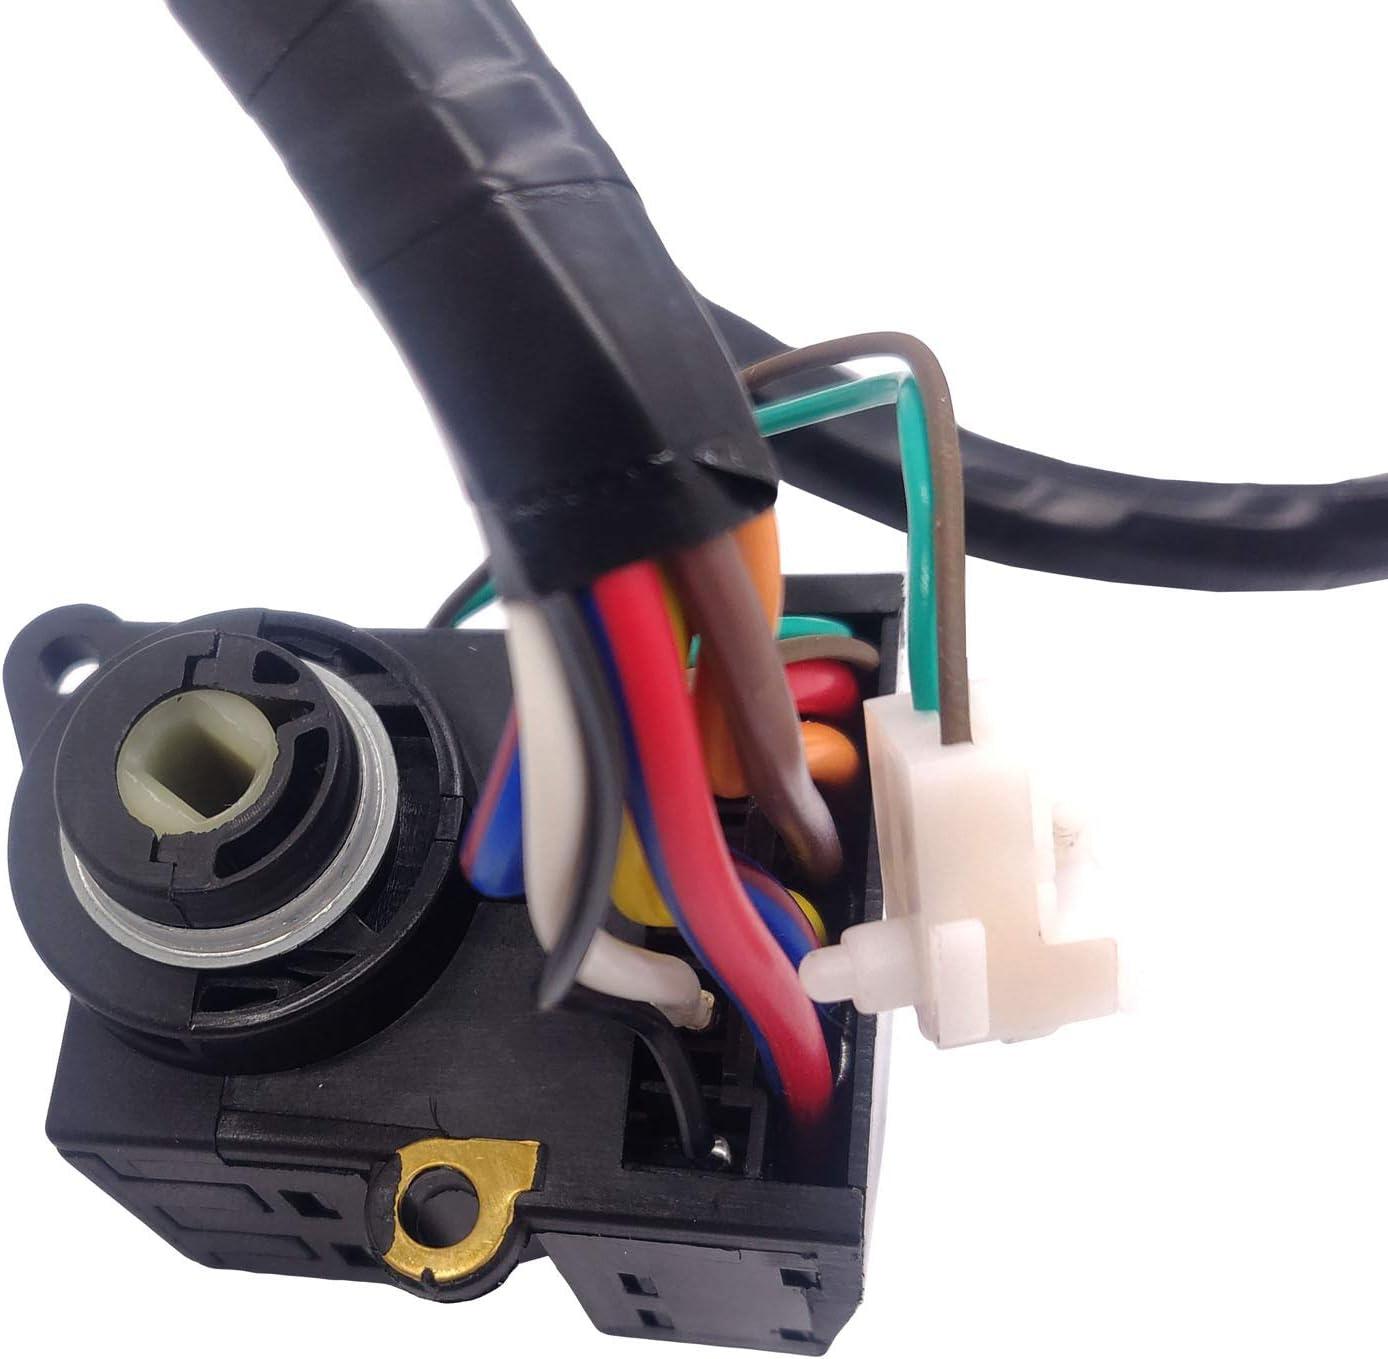 Ignition Switch for 1995-1998 Chevy C1500 Suburban K1500 Pickup S10 Tahoe Blazer GMC C1500 Pickup K1500 Pickup Suburban Yukon Jimmy Sonoma 26036311